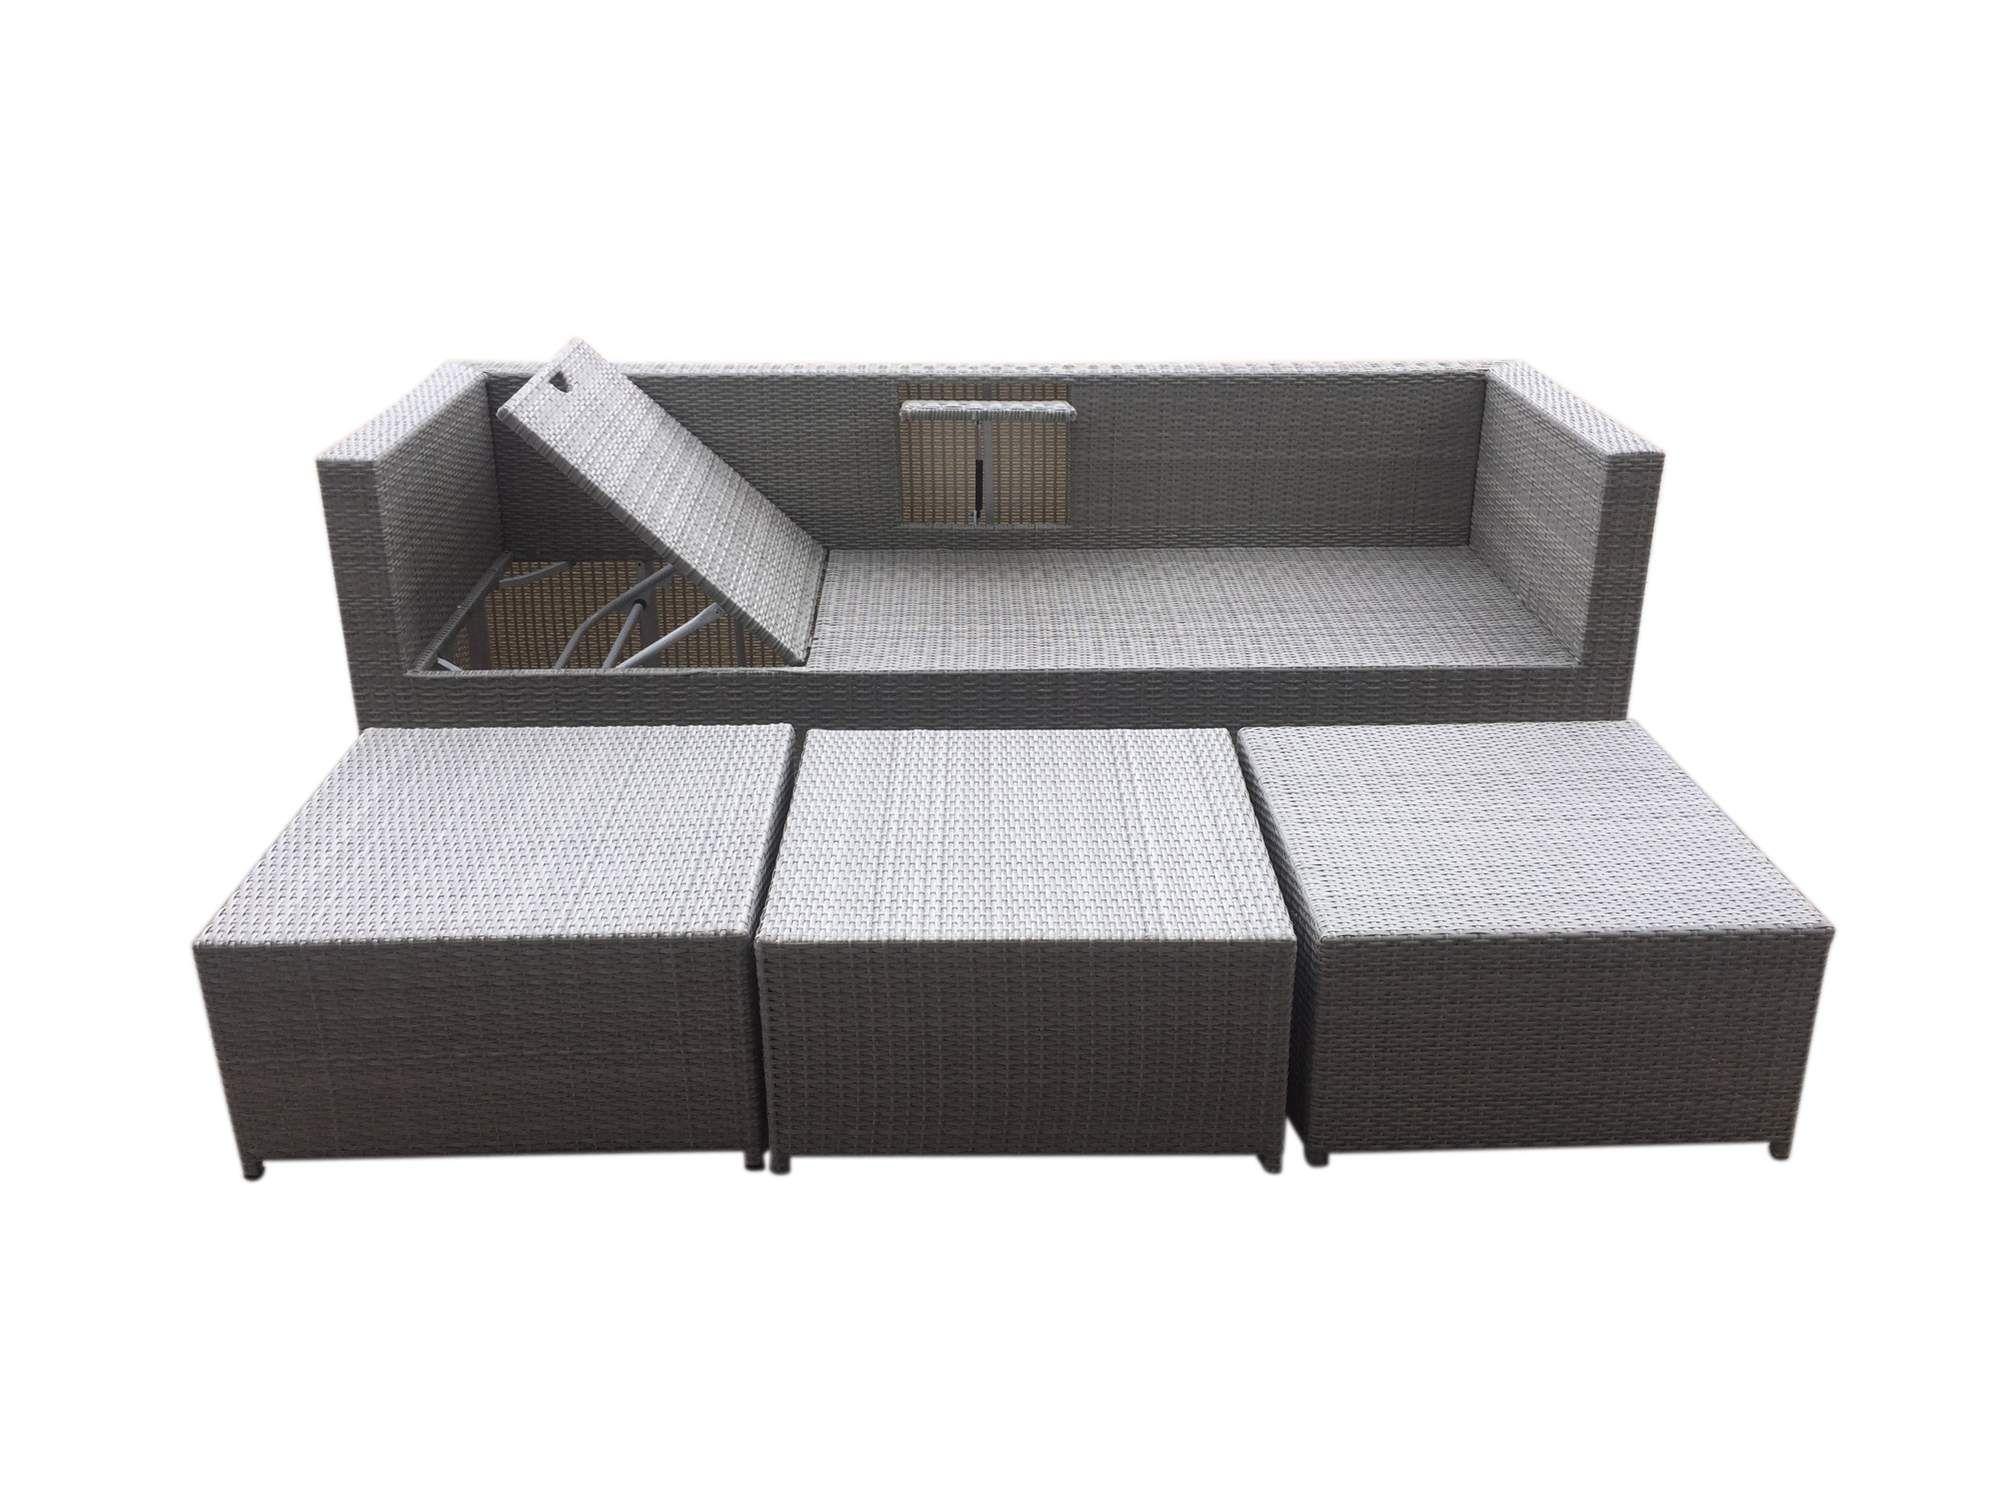 Full Size of Polyrattan Sofa Outdoor Tchibo Lounge Garden Set Couch Ausziehbar Grau Rattan 2 Sitzer Balkon Gartensofa 2 Sitzer 4 Tlg Aluminiumgestell Boxspring Günstige Sofa Polyrattan Sofa